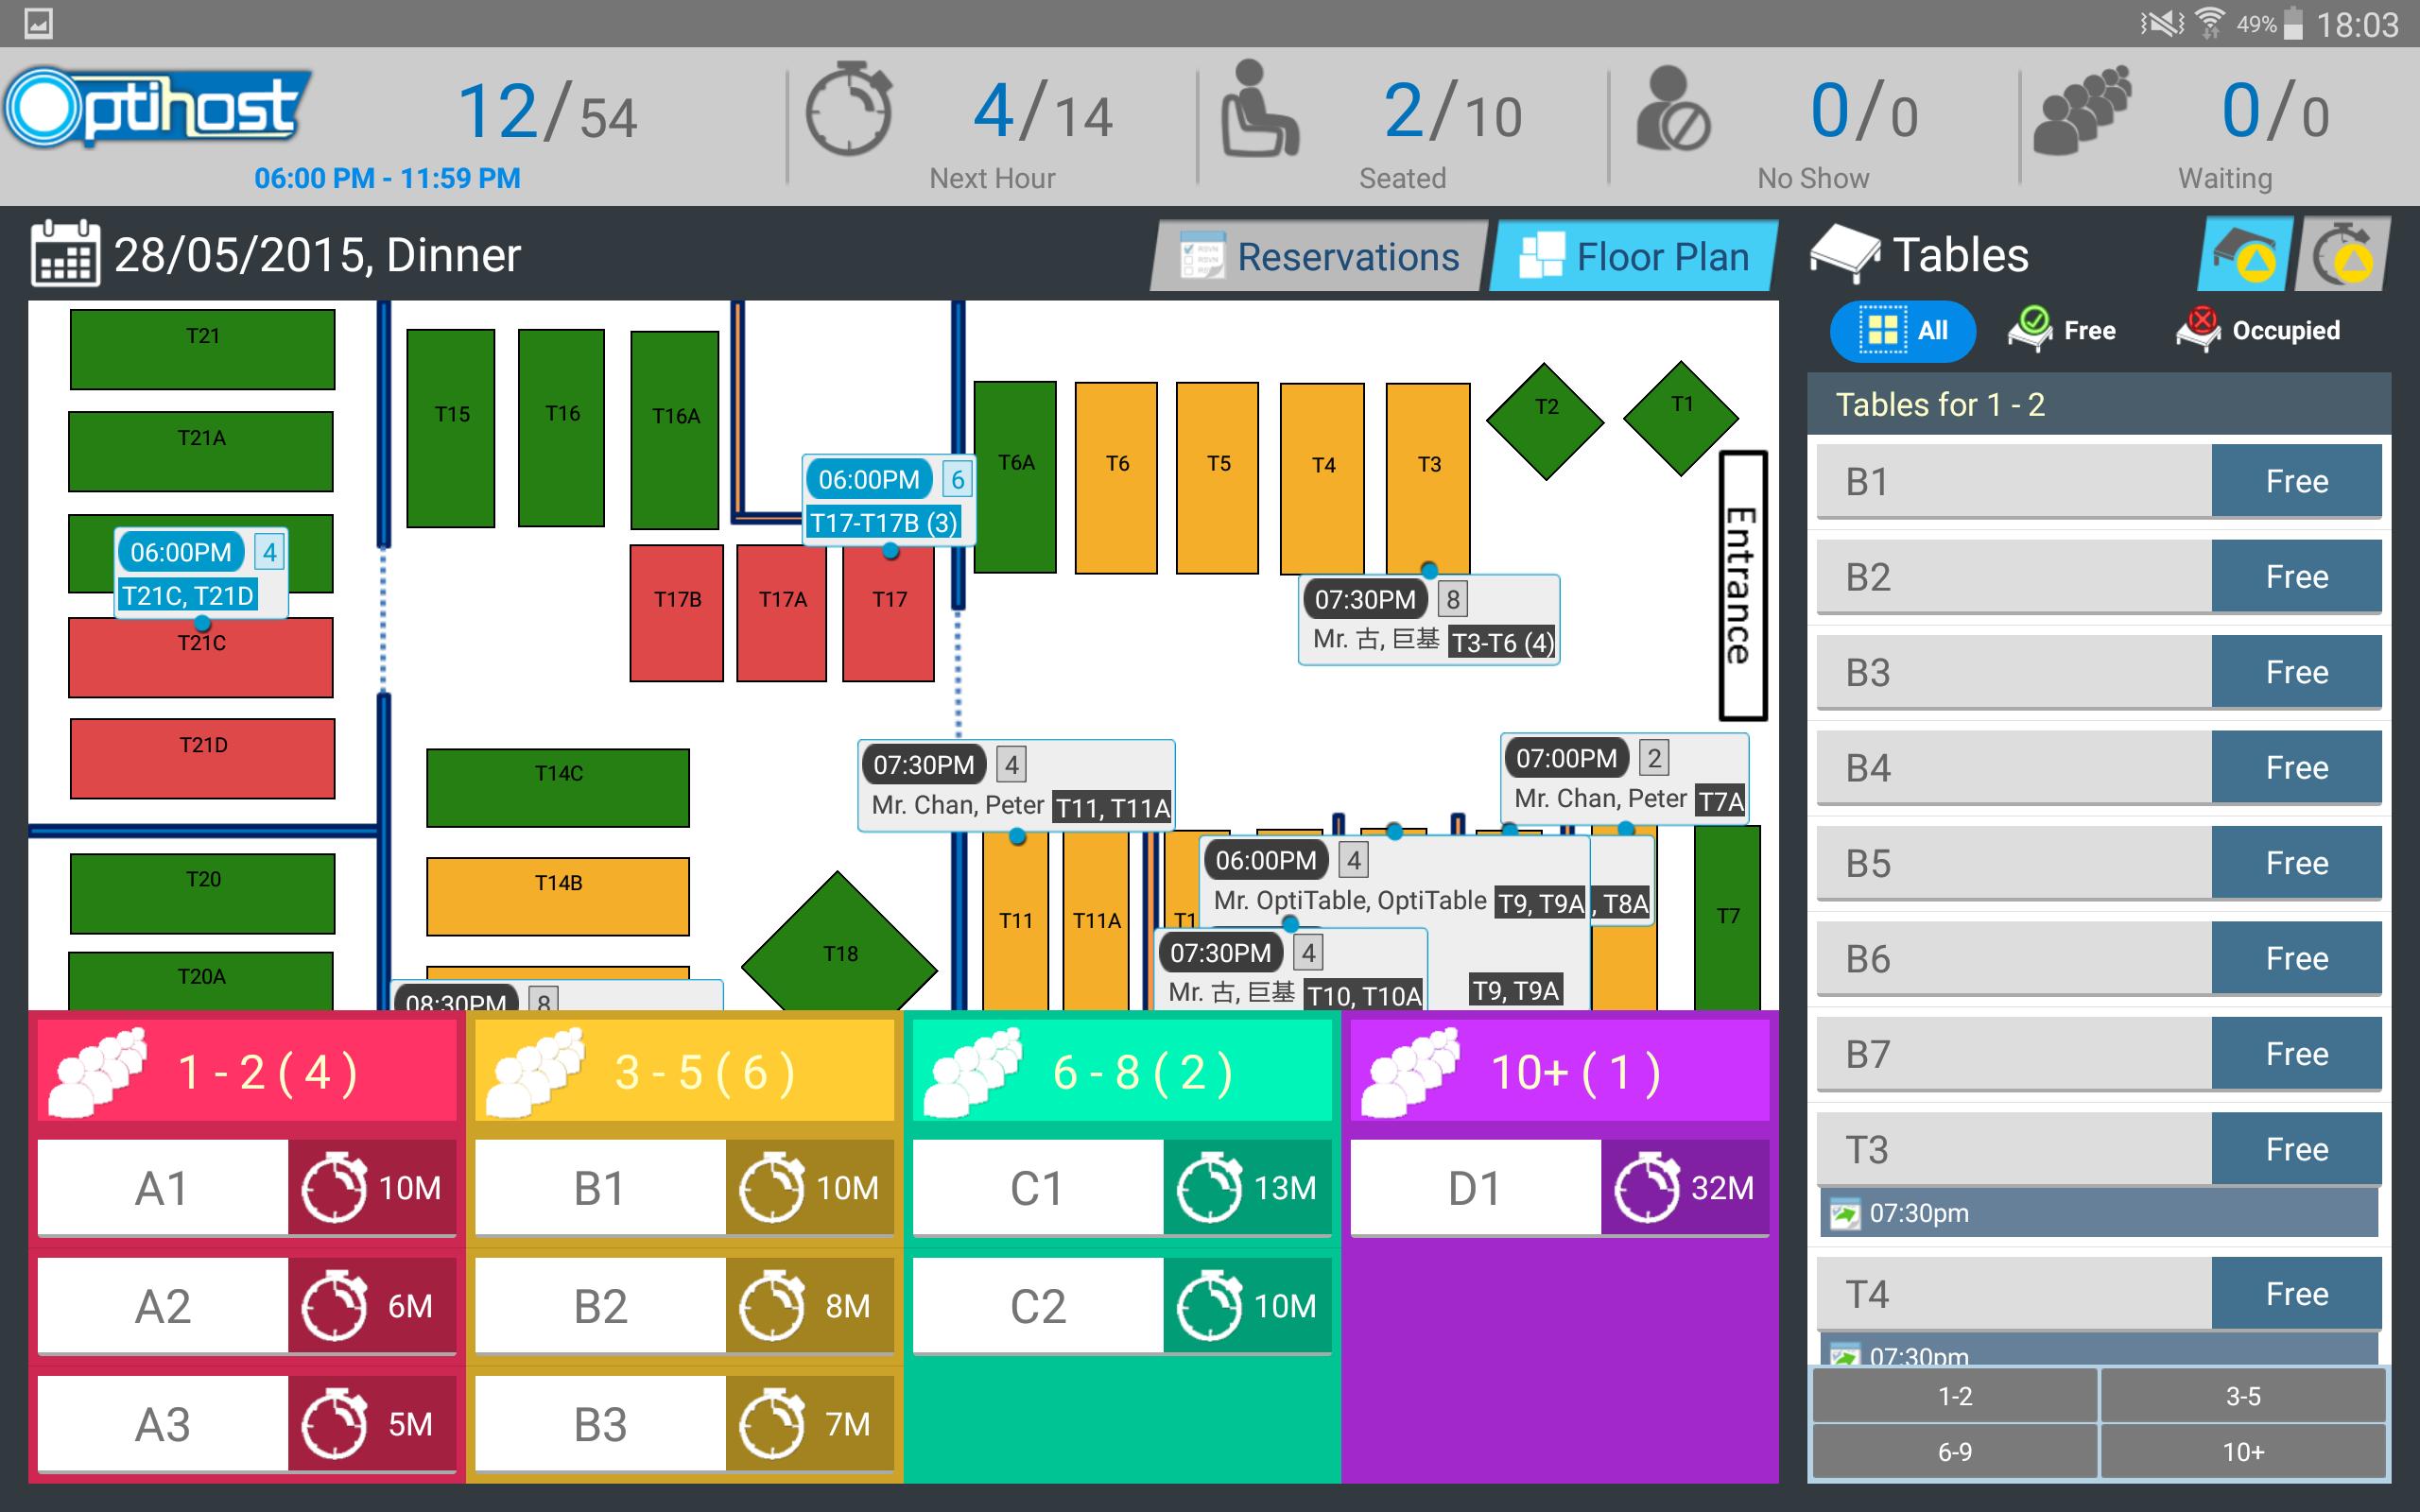 OptiHost - Floor Plan Mode